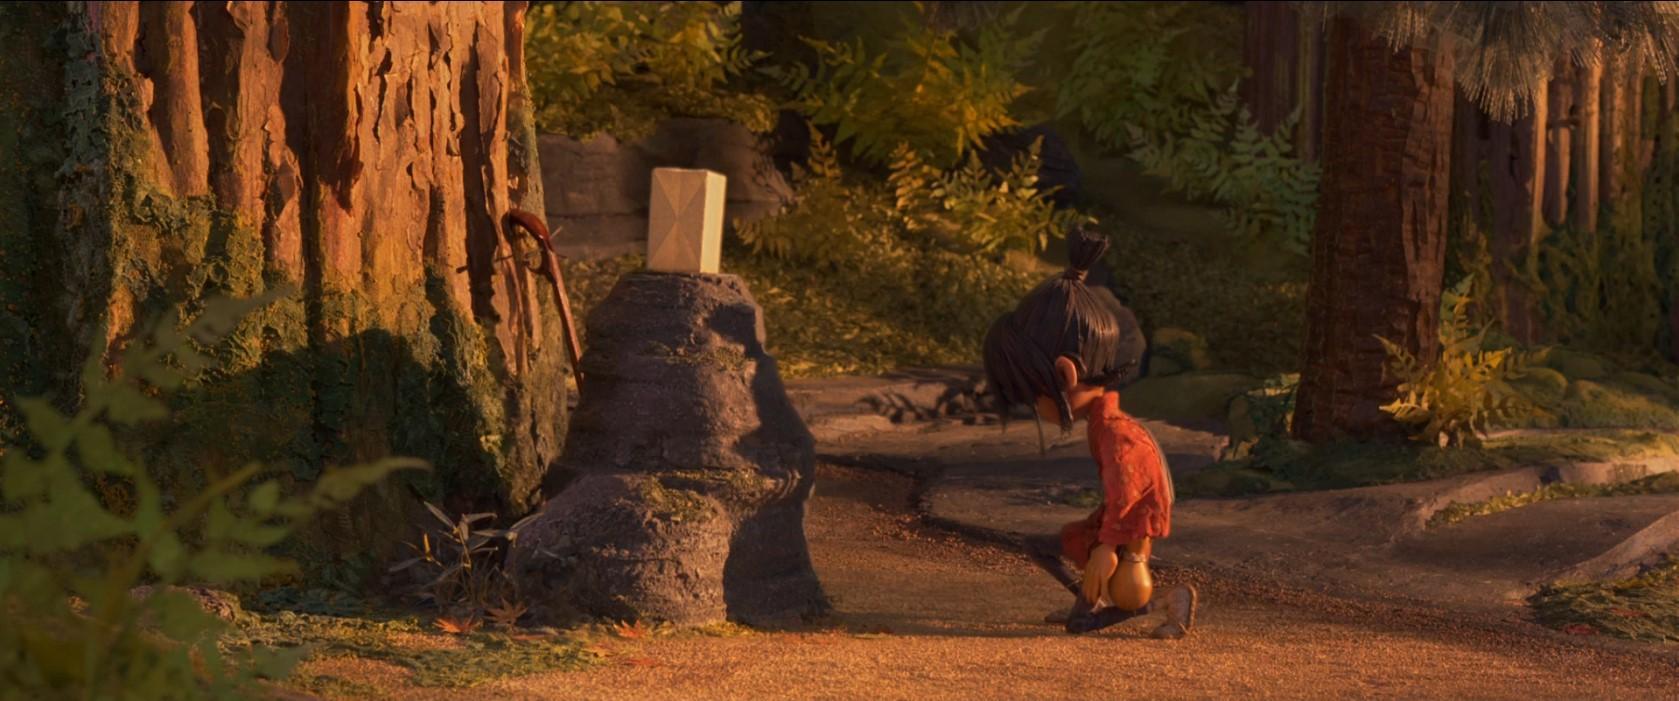 Кубо. Легенда о самурае